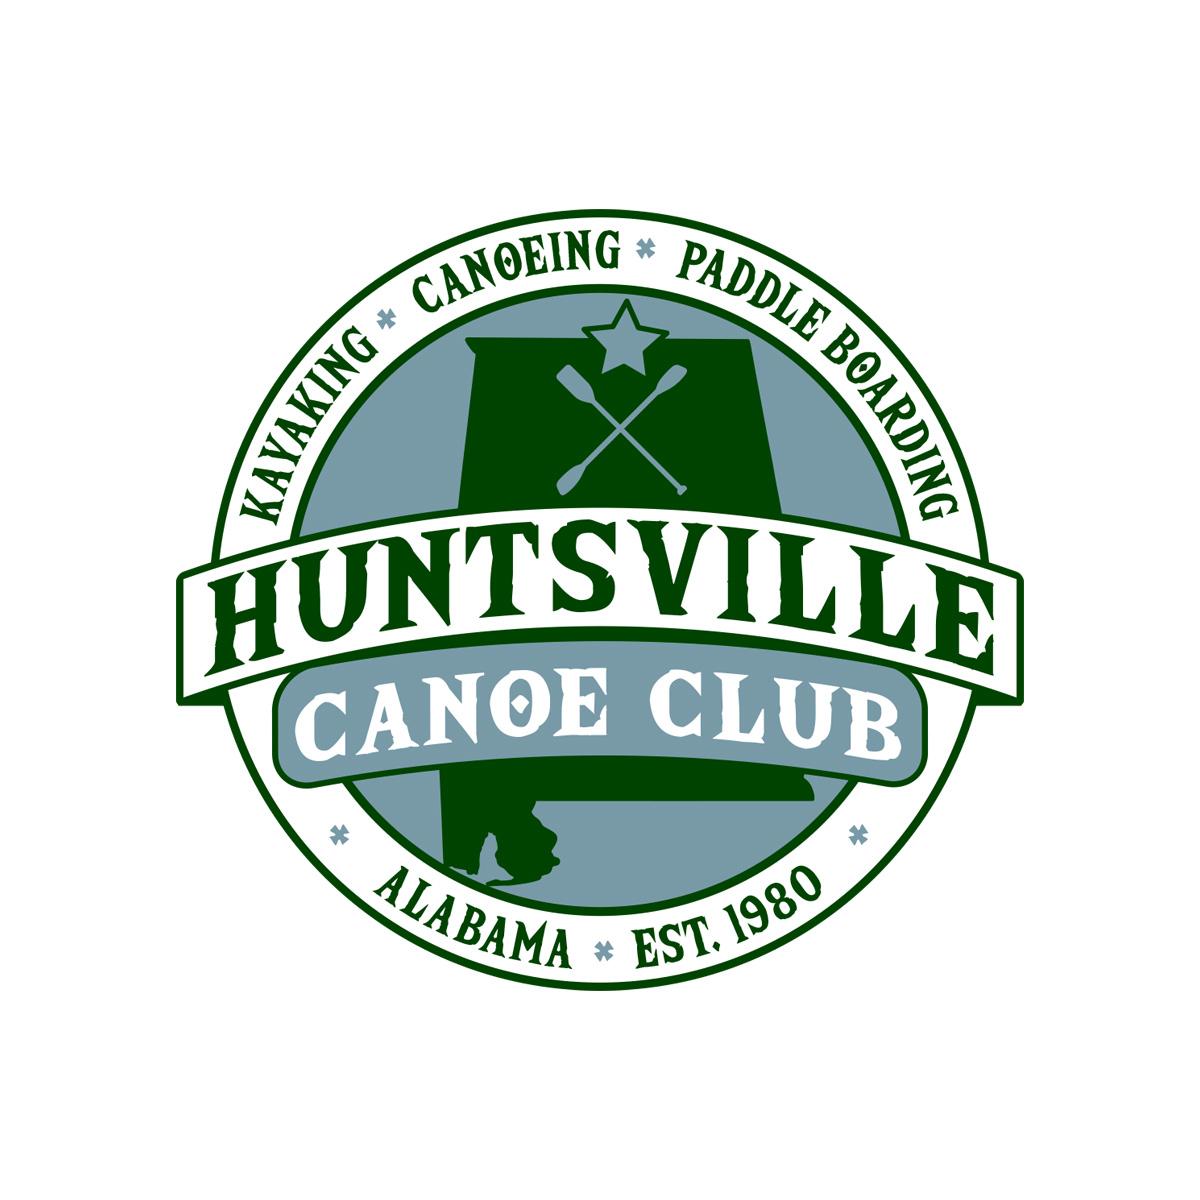 Huntsville Canoe Club